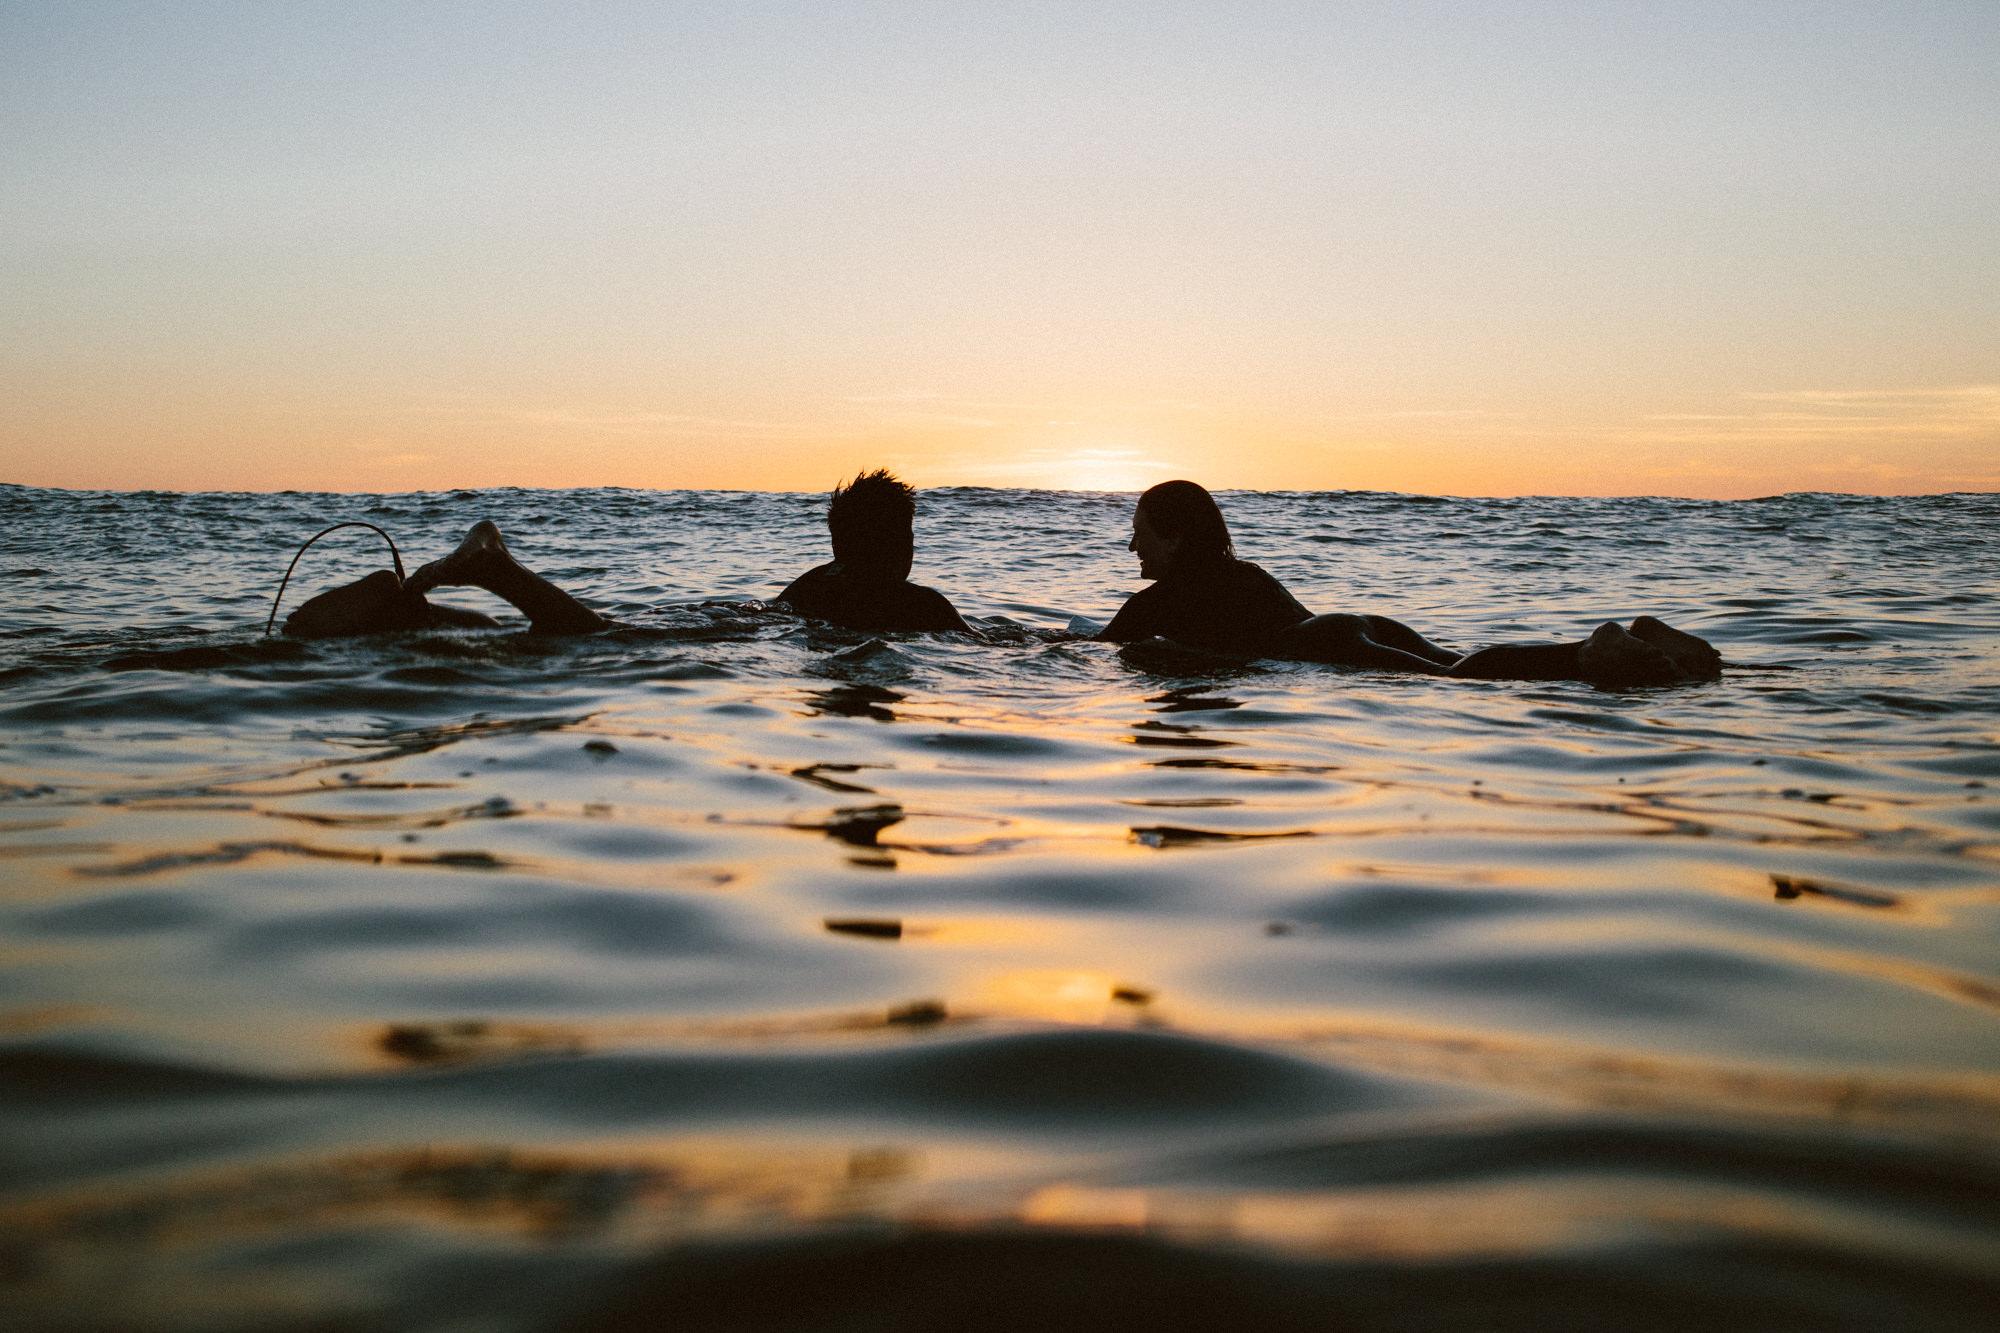 celinehamelin-photographe-aquatique-underwater-session-social-coupledansleau-ocean3.jpg